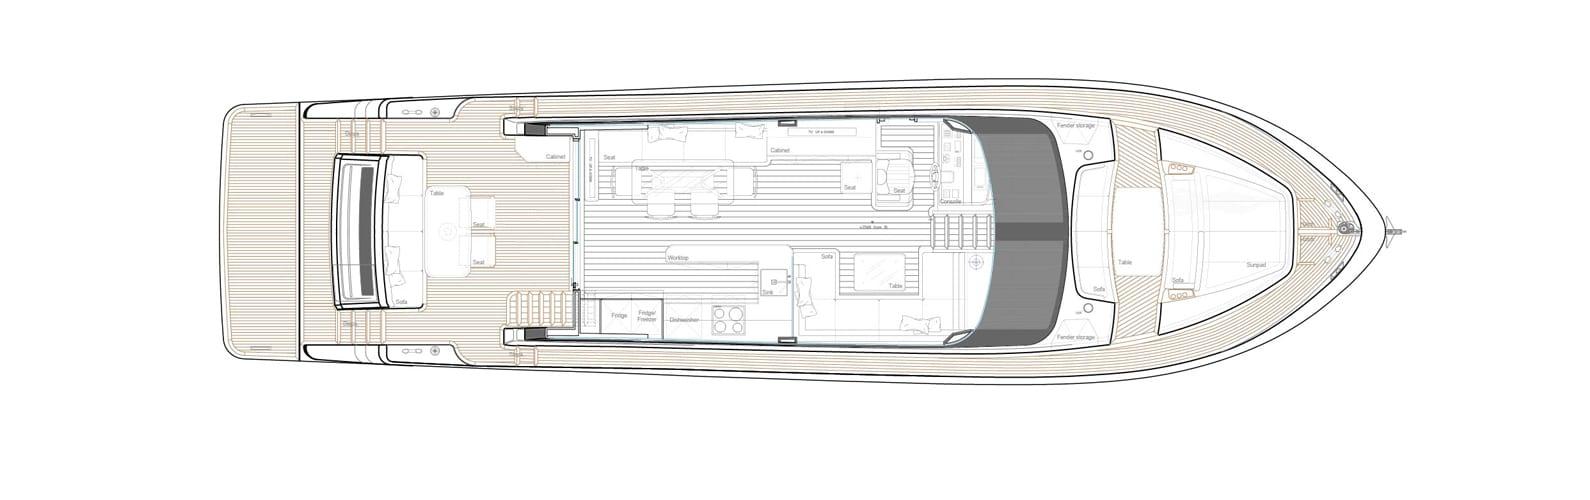 Uniesse-Capri-6-footprint4-rooms3